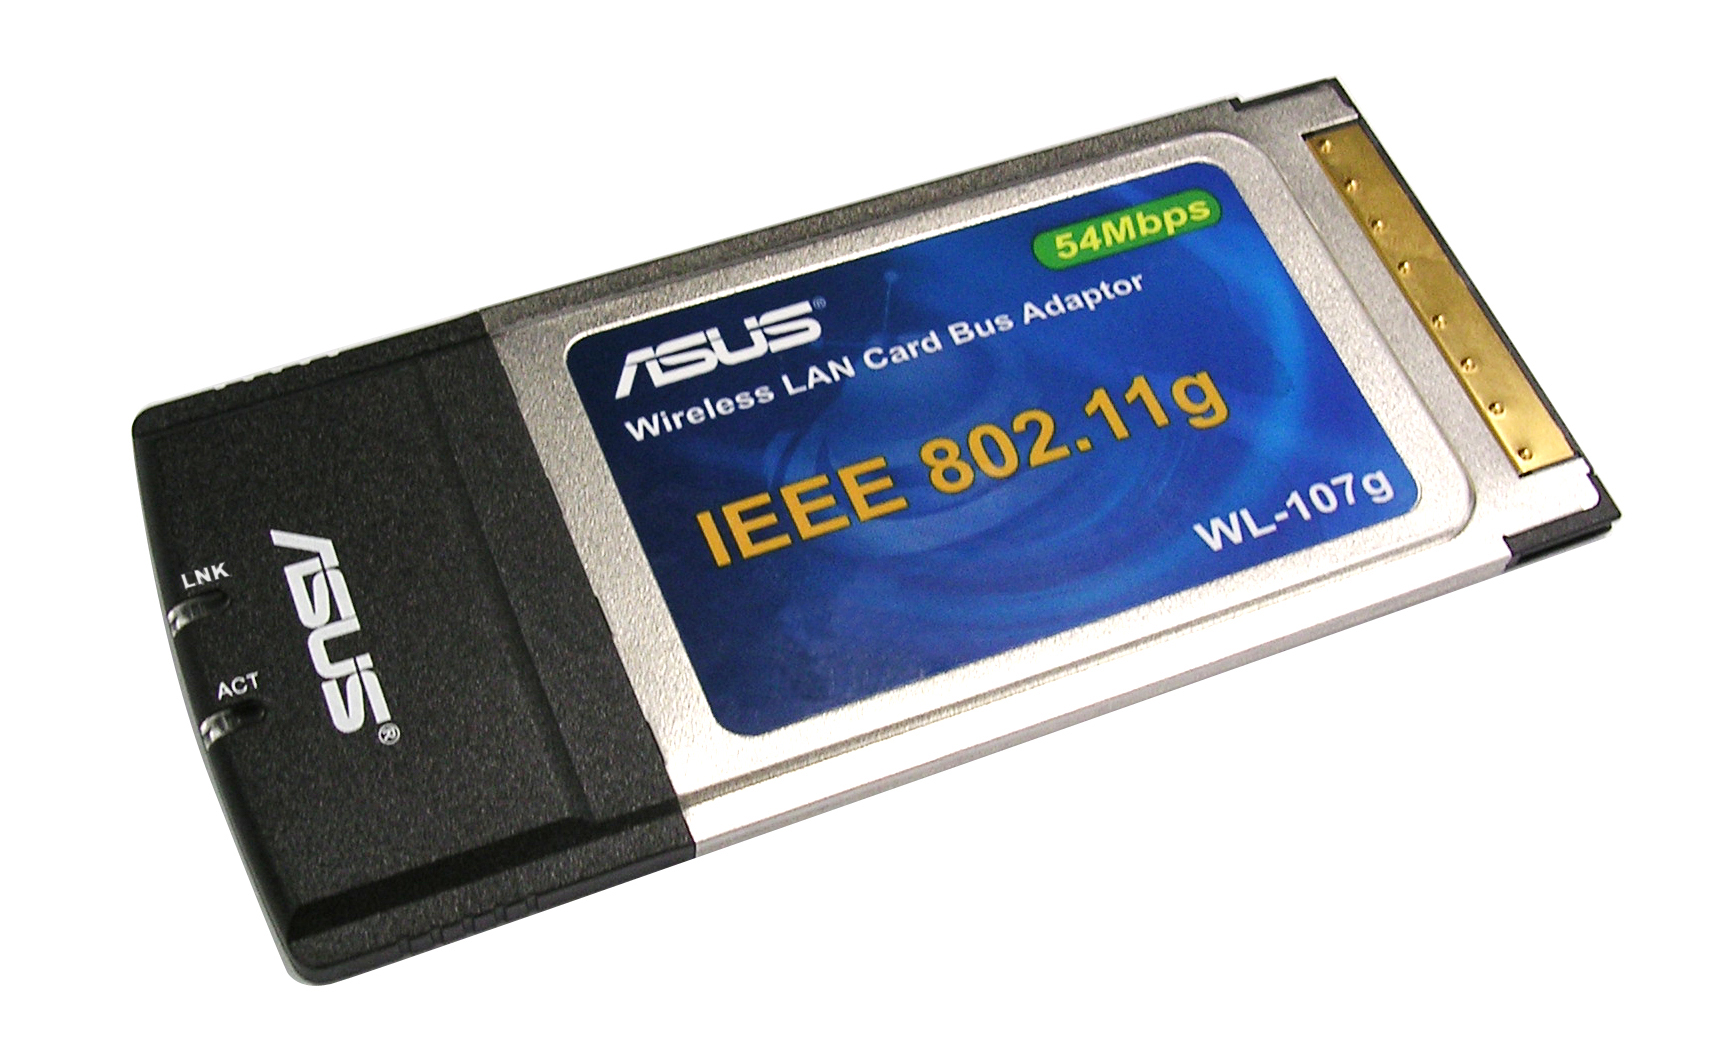 I,P - WL-107G PCMCIA WIFI